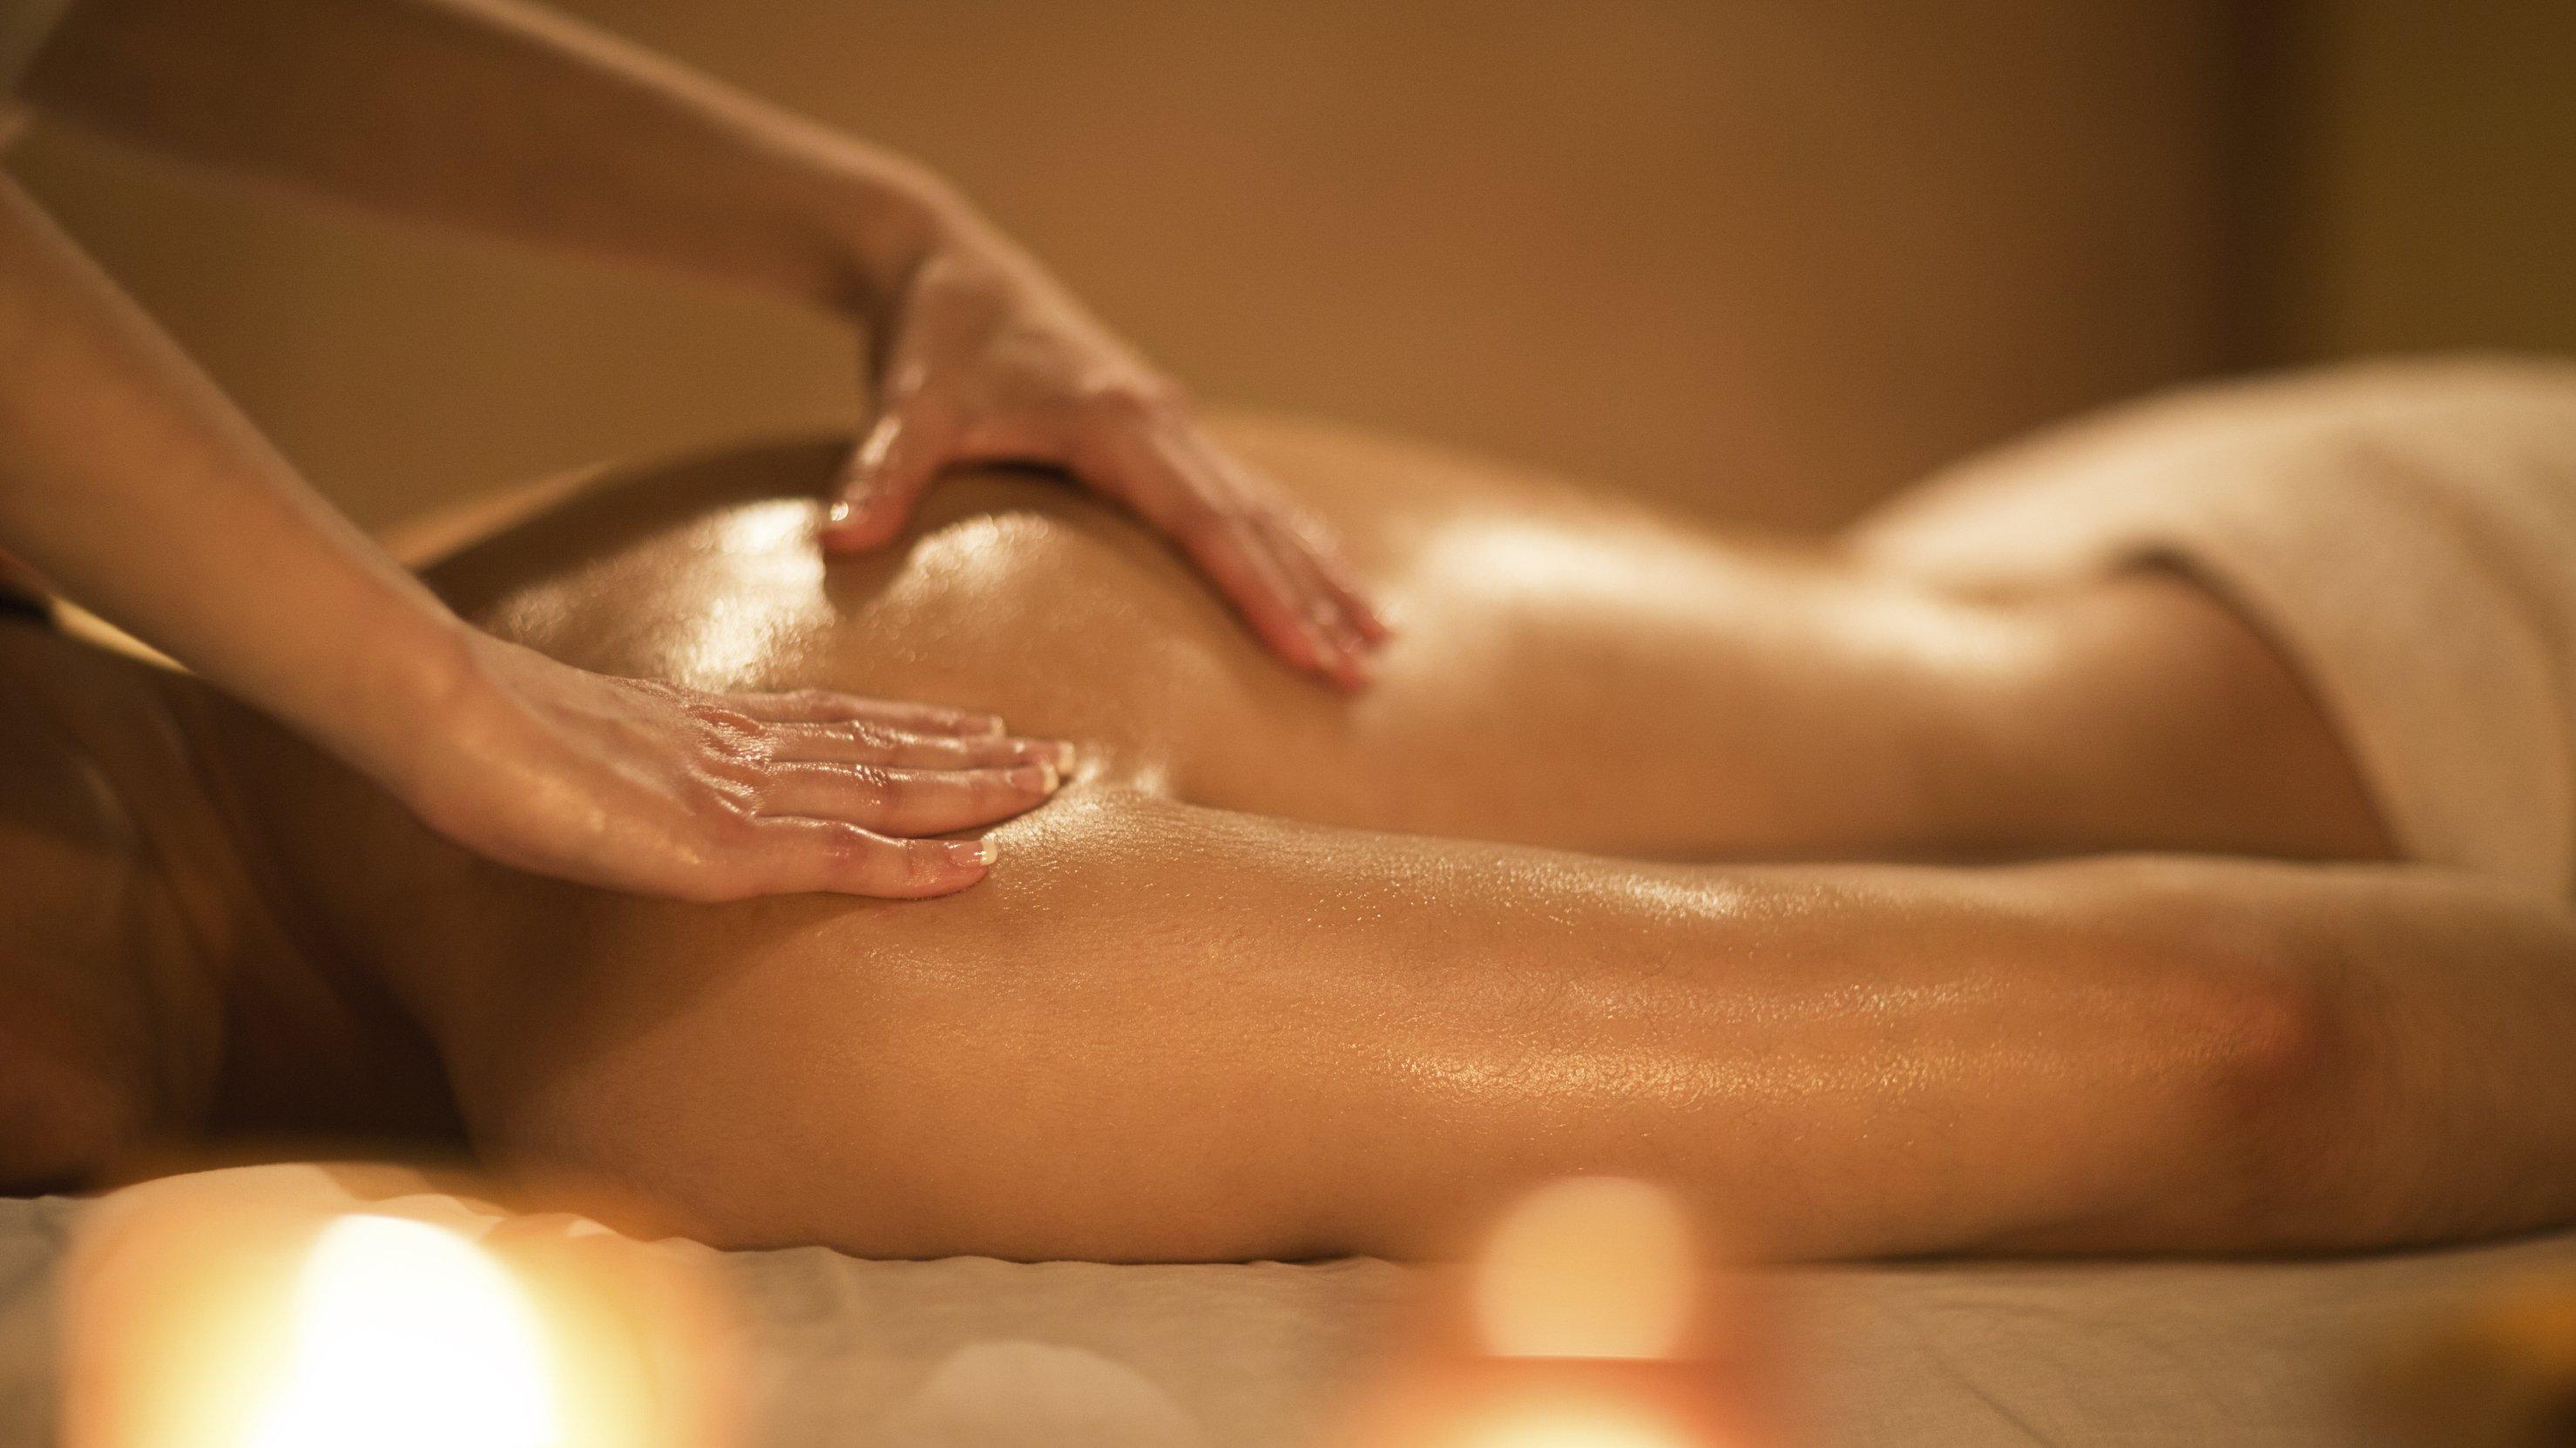 sensual lingam bøsse massage exotic nude massage